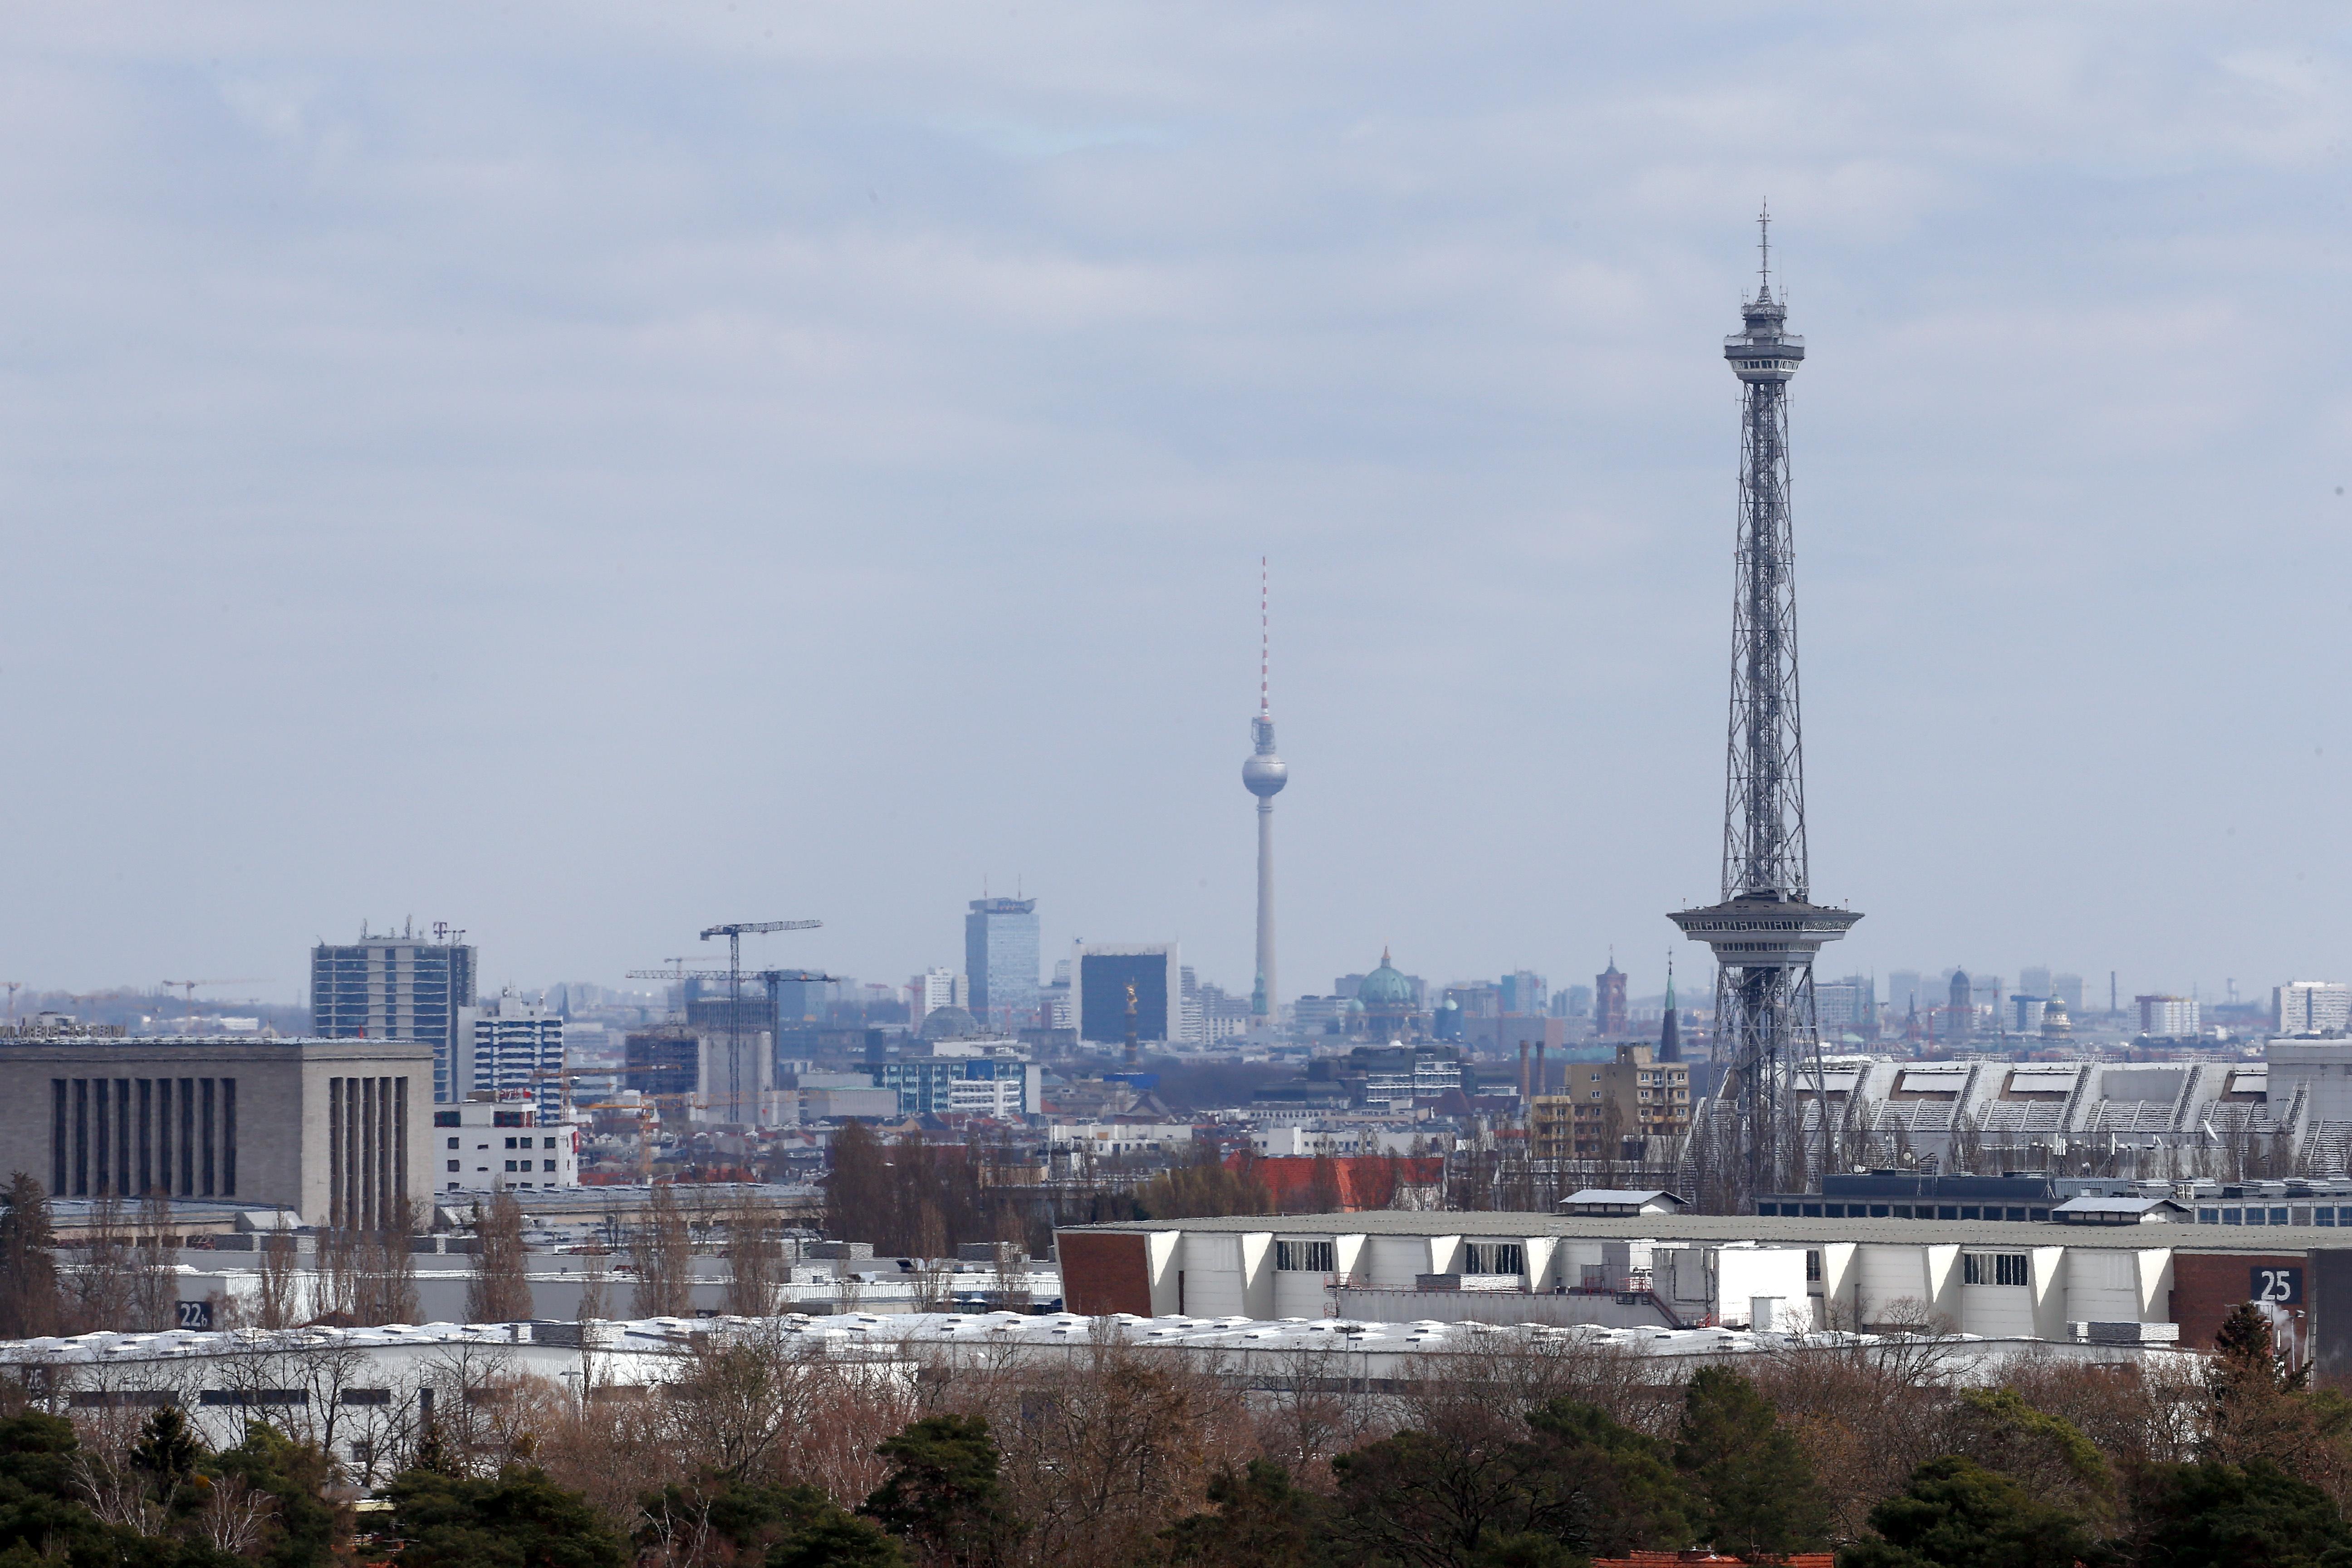 The Berlin skyline is seen, during the spread of coronavirus disease (COVID-19) in Berlin, Germany, April 1, 2020. REUTERS/Michele Tantussi